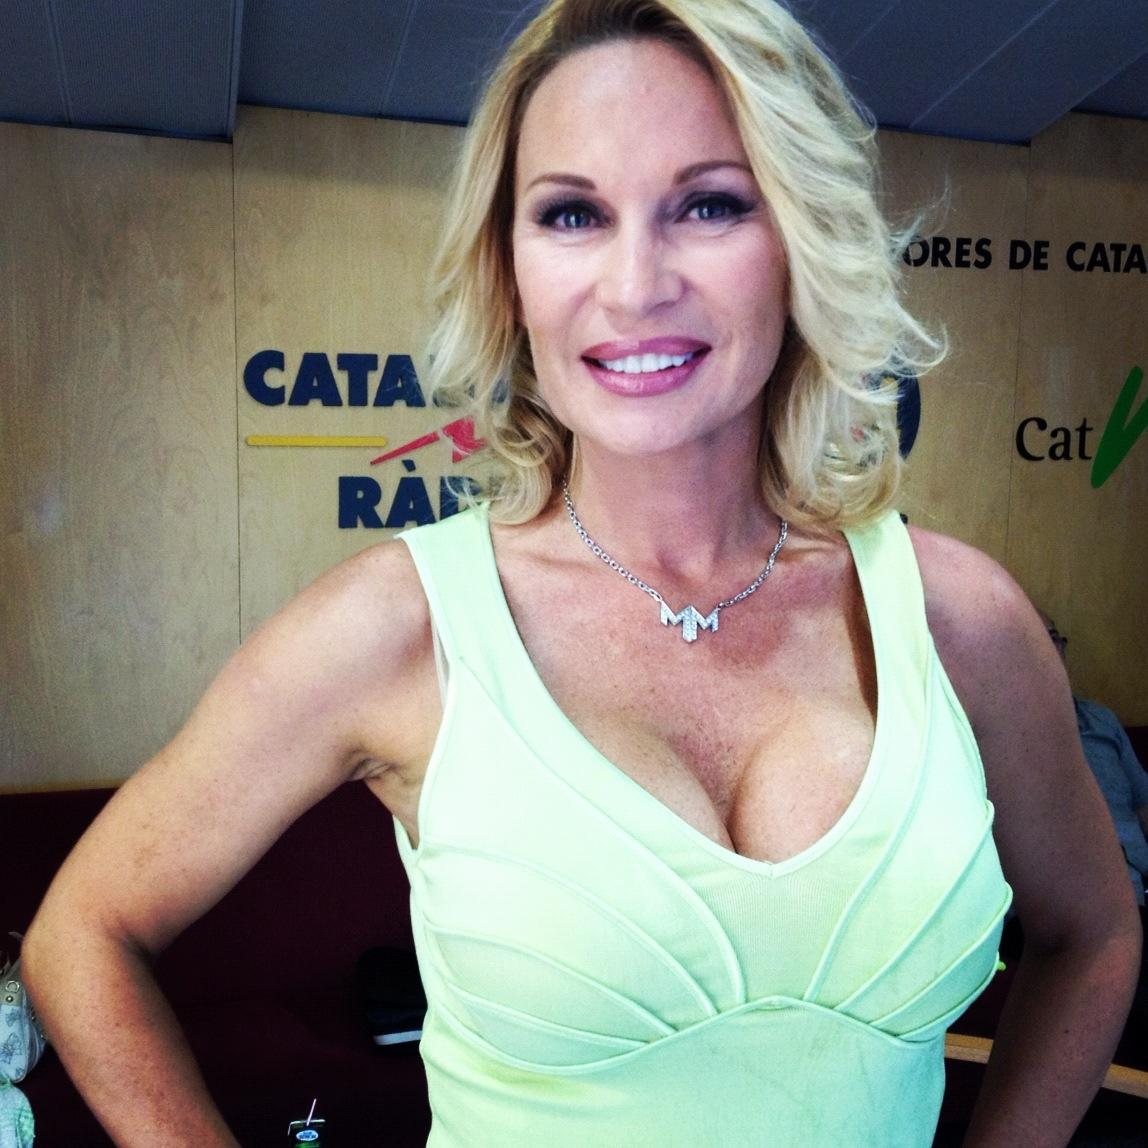 Marlene Mourreau nudes (97 images) Tits, Instagram, braless